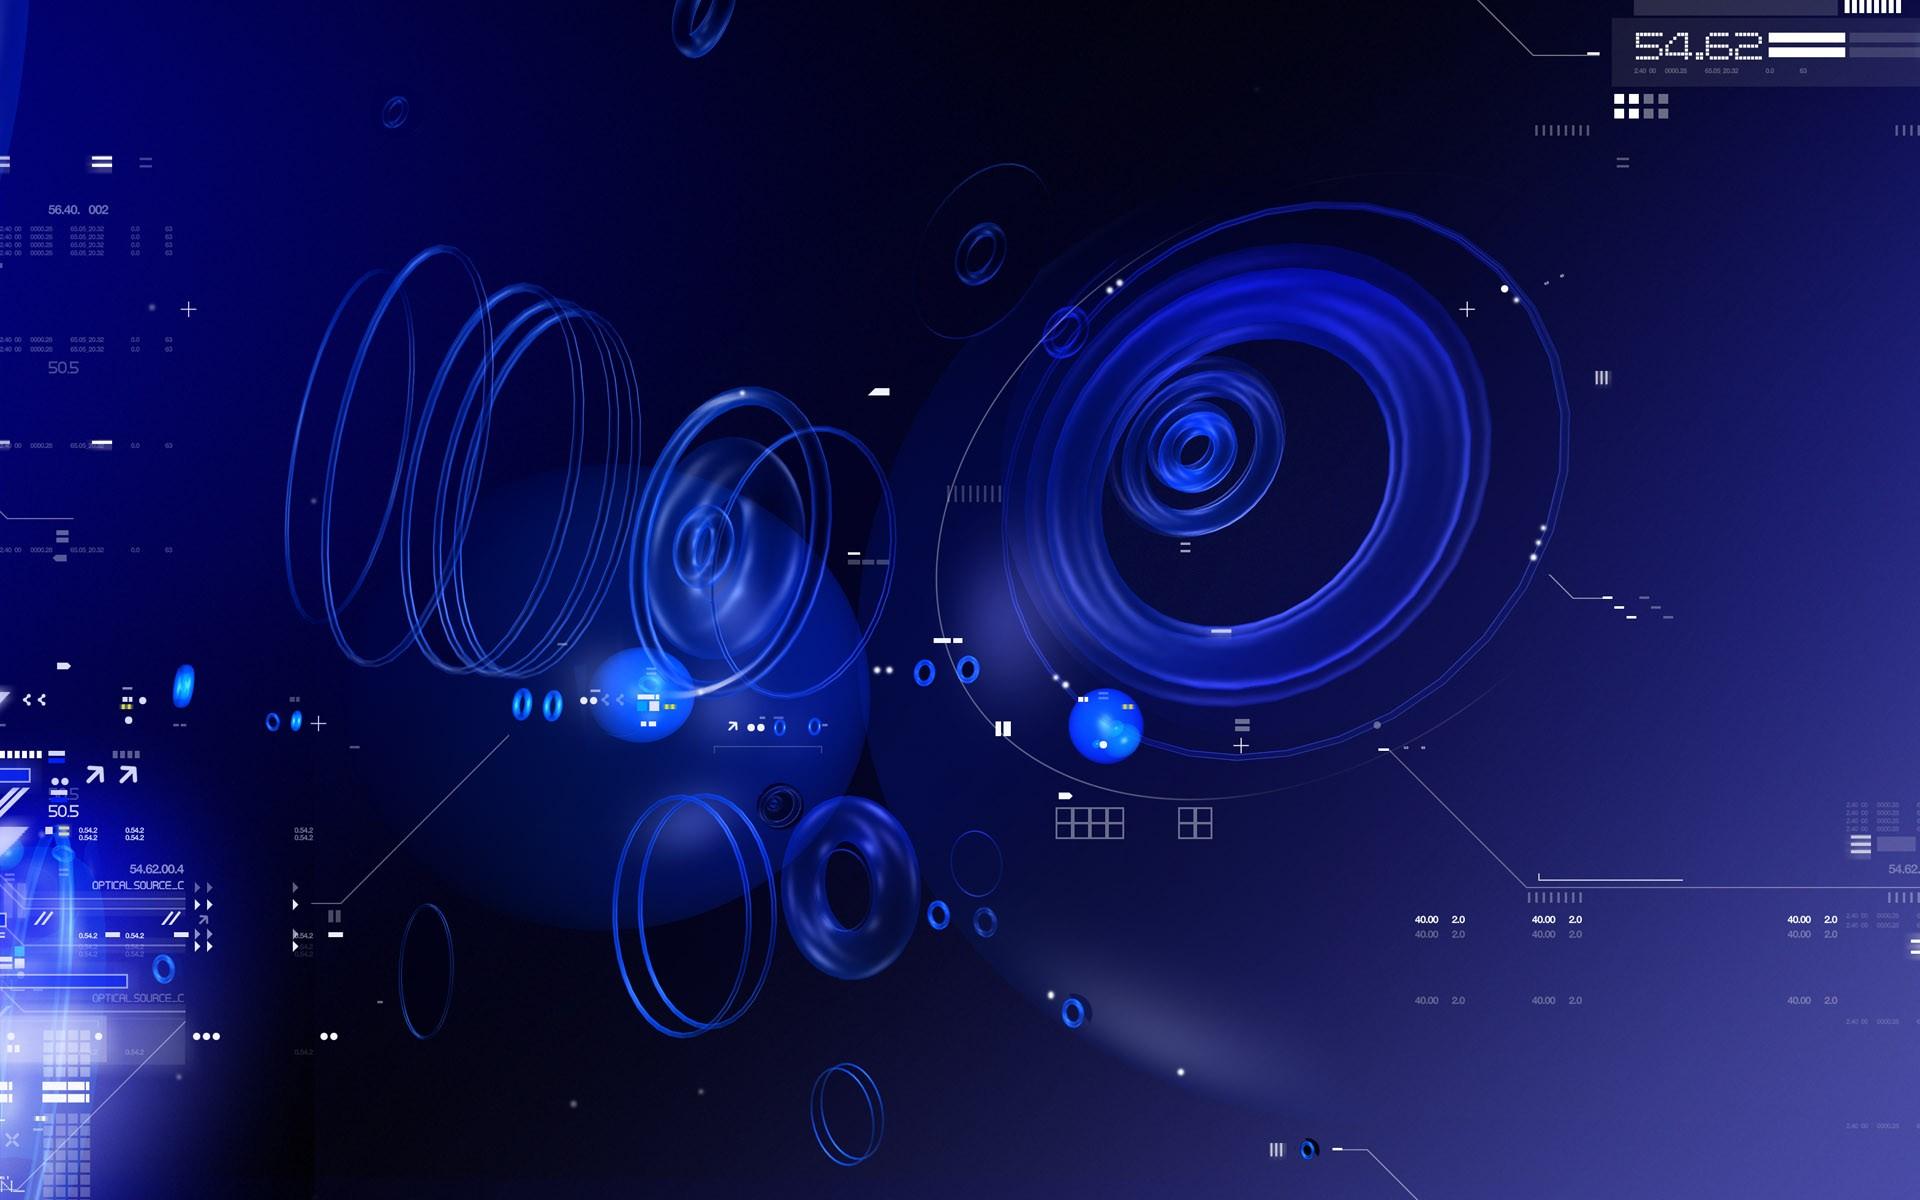 Blue Tech Circles PPT Backgrounds